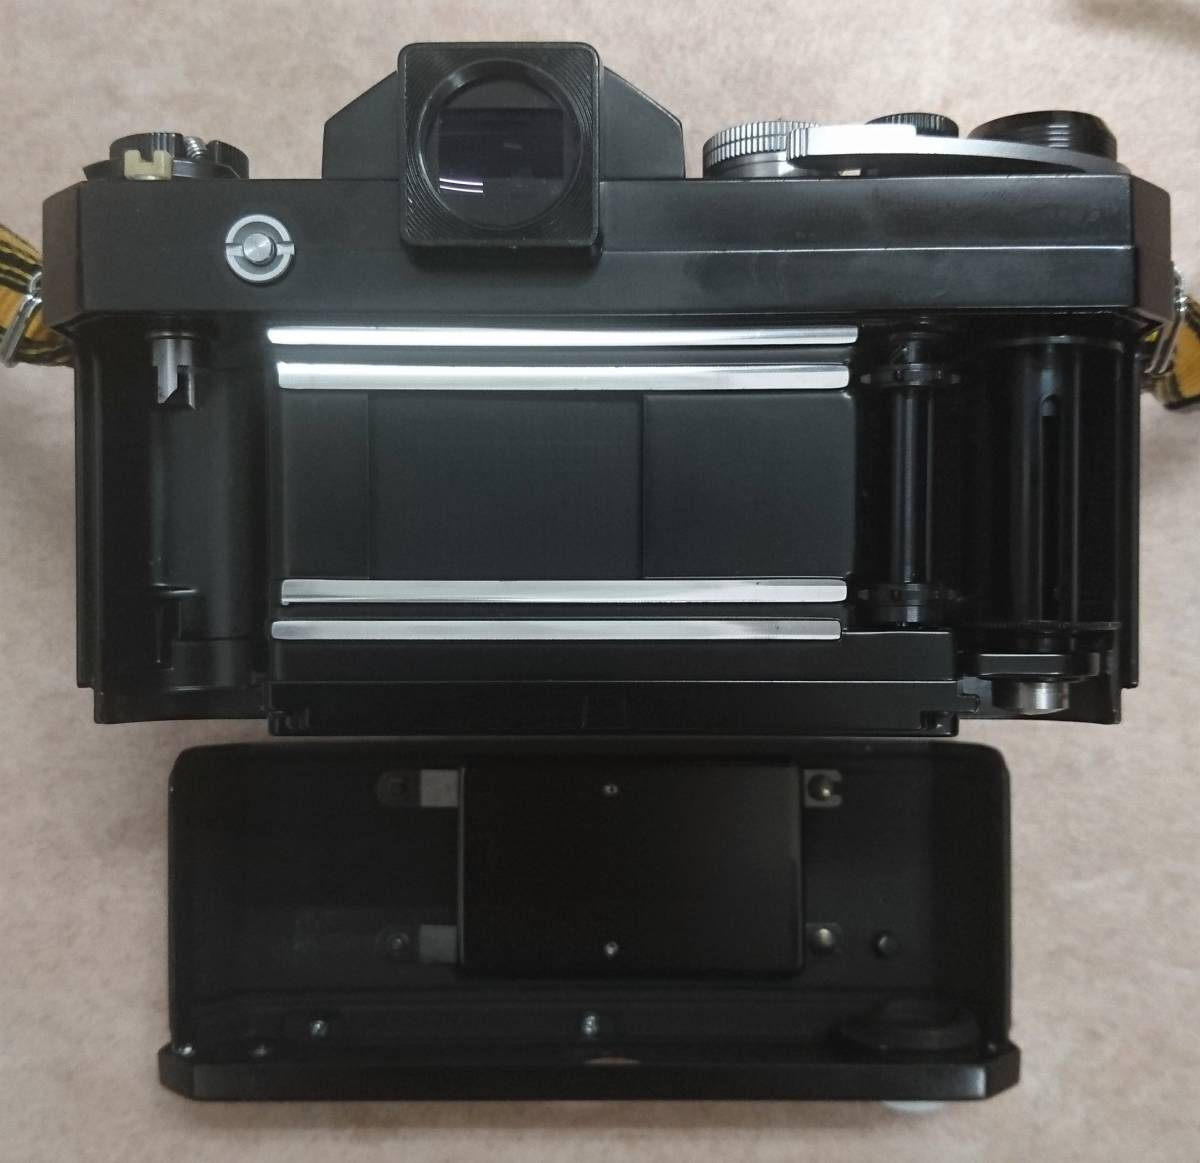 ◇ Nikon F Brack ニコンFブラックボディ NIKKOR-H Auto 1:2 f=50㎜ ◇_画像7